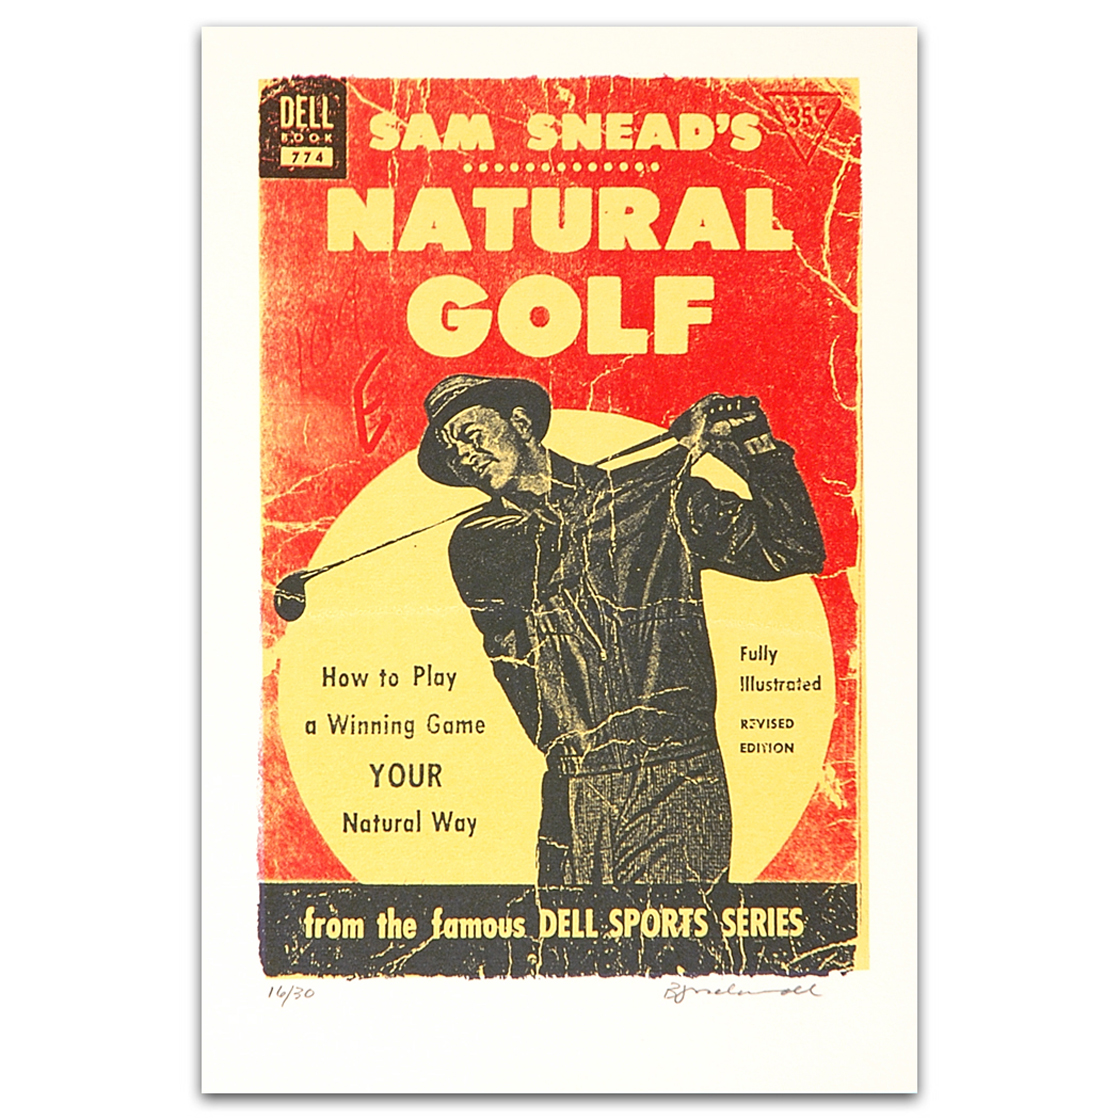 Sam Snead's Natural Gold. Billy McCarroll